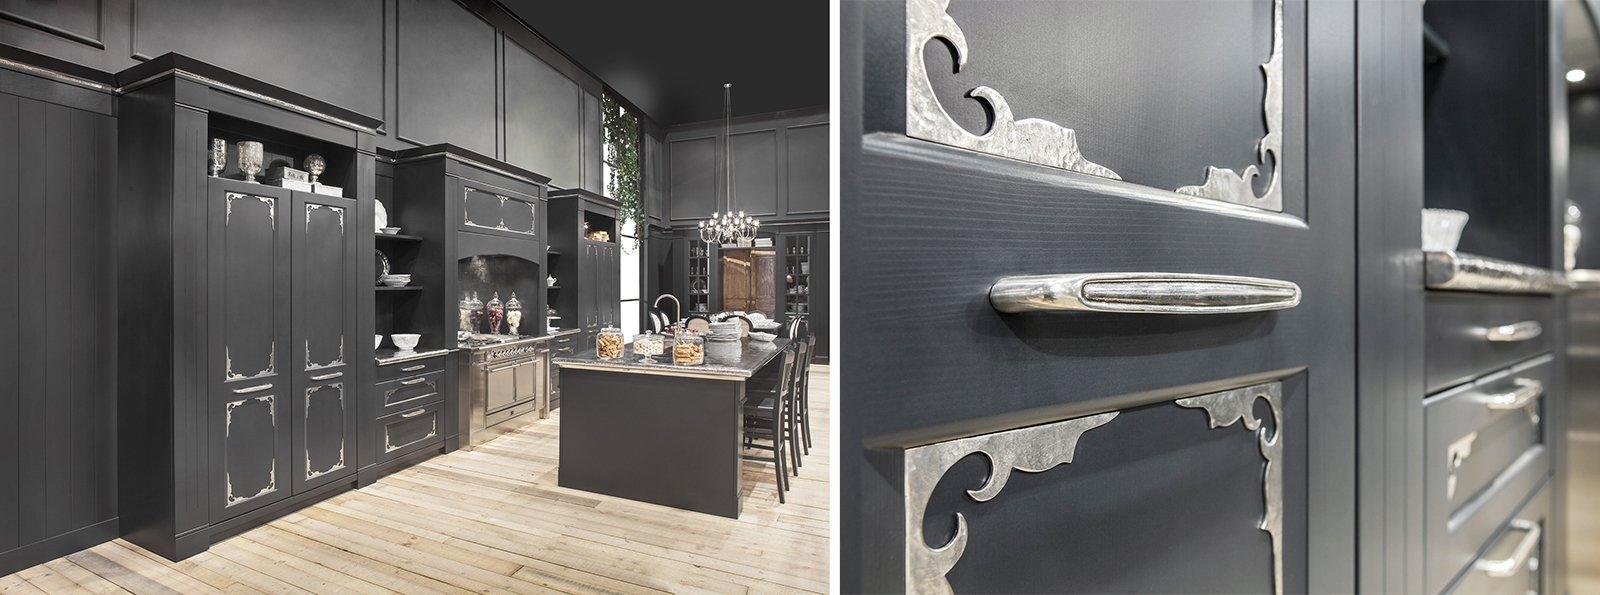 Casabook Immobiliare: Cucine decorate per un ambiente originale e ...